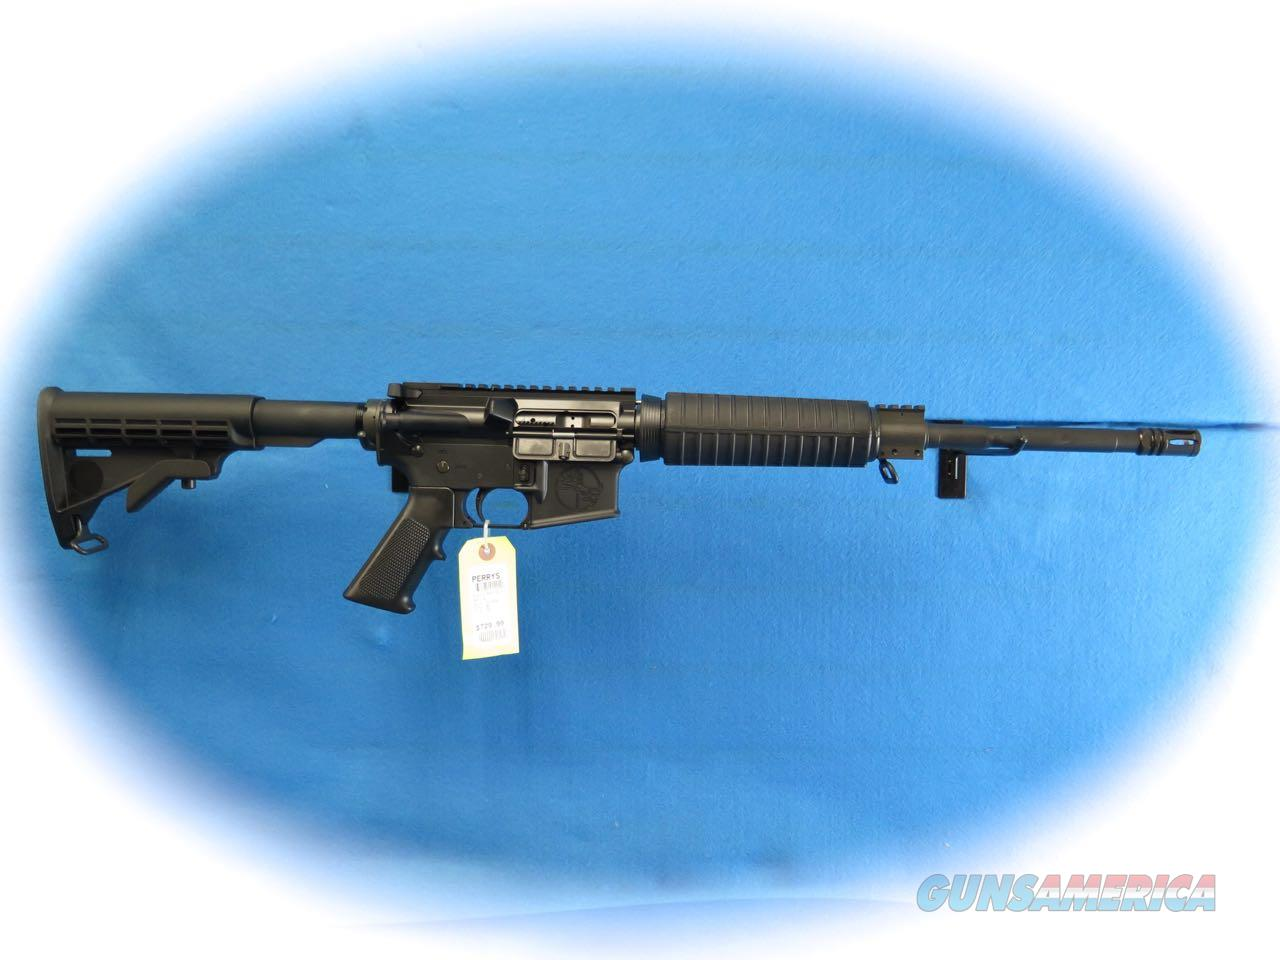 Armalite DEF15 AR-15 Semi Auto Rifle 5.56mm Cal **New**  Guns > Rifles > Armalite Rifles > Complete Rifles